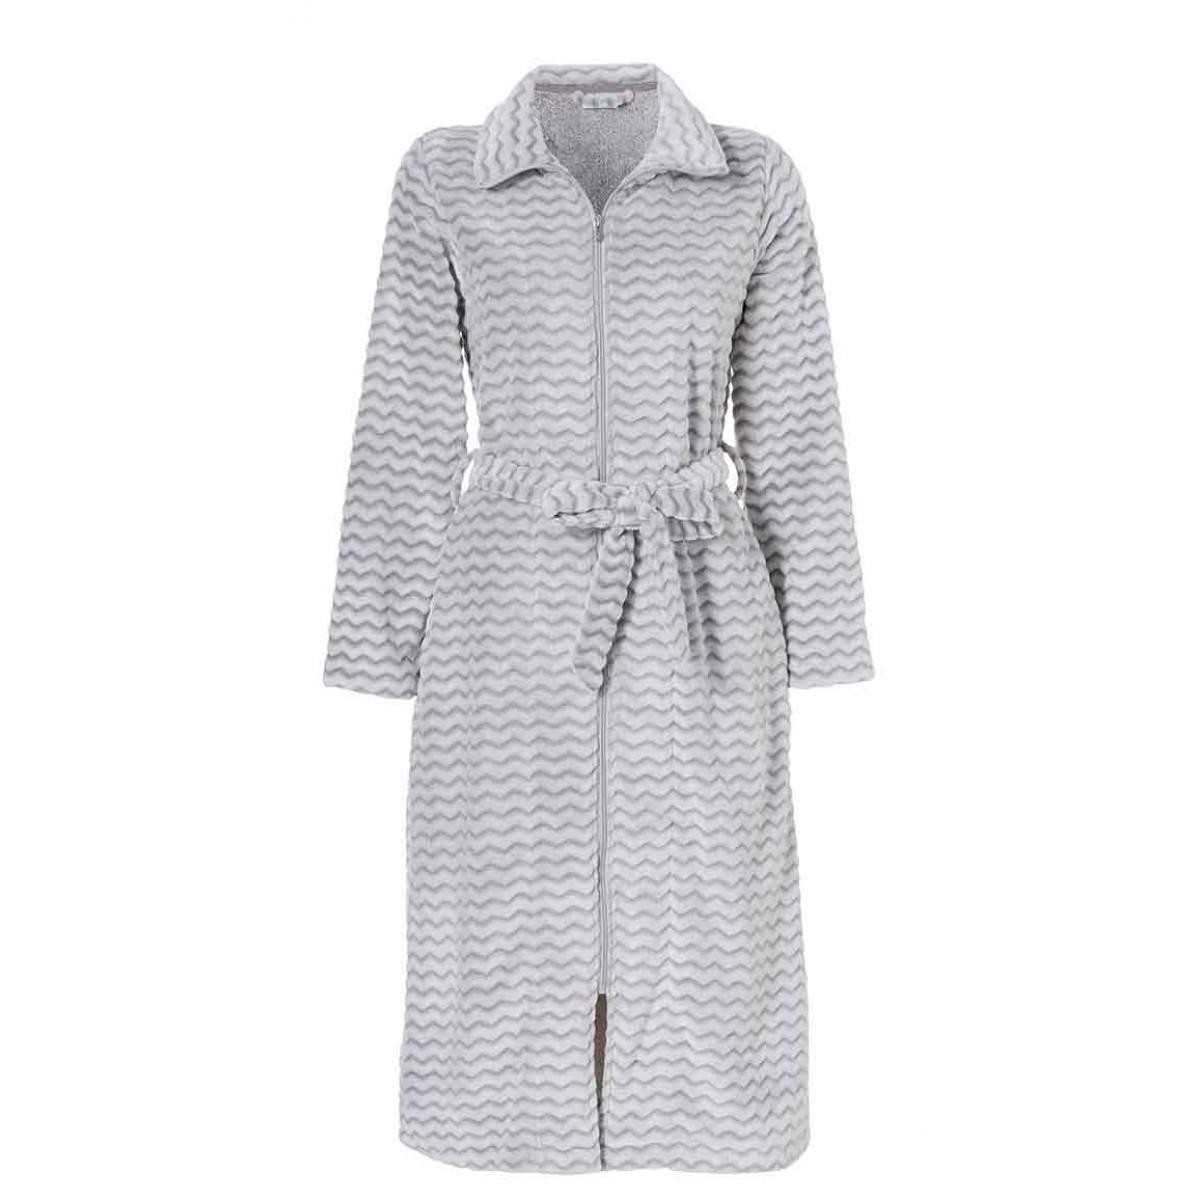 Fleece badjas met rits - lang model badjas